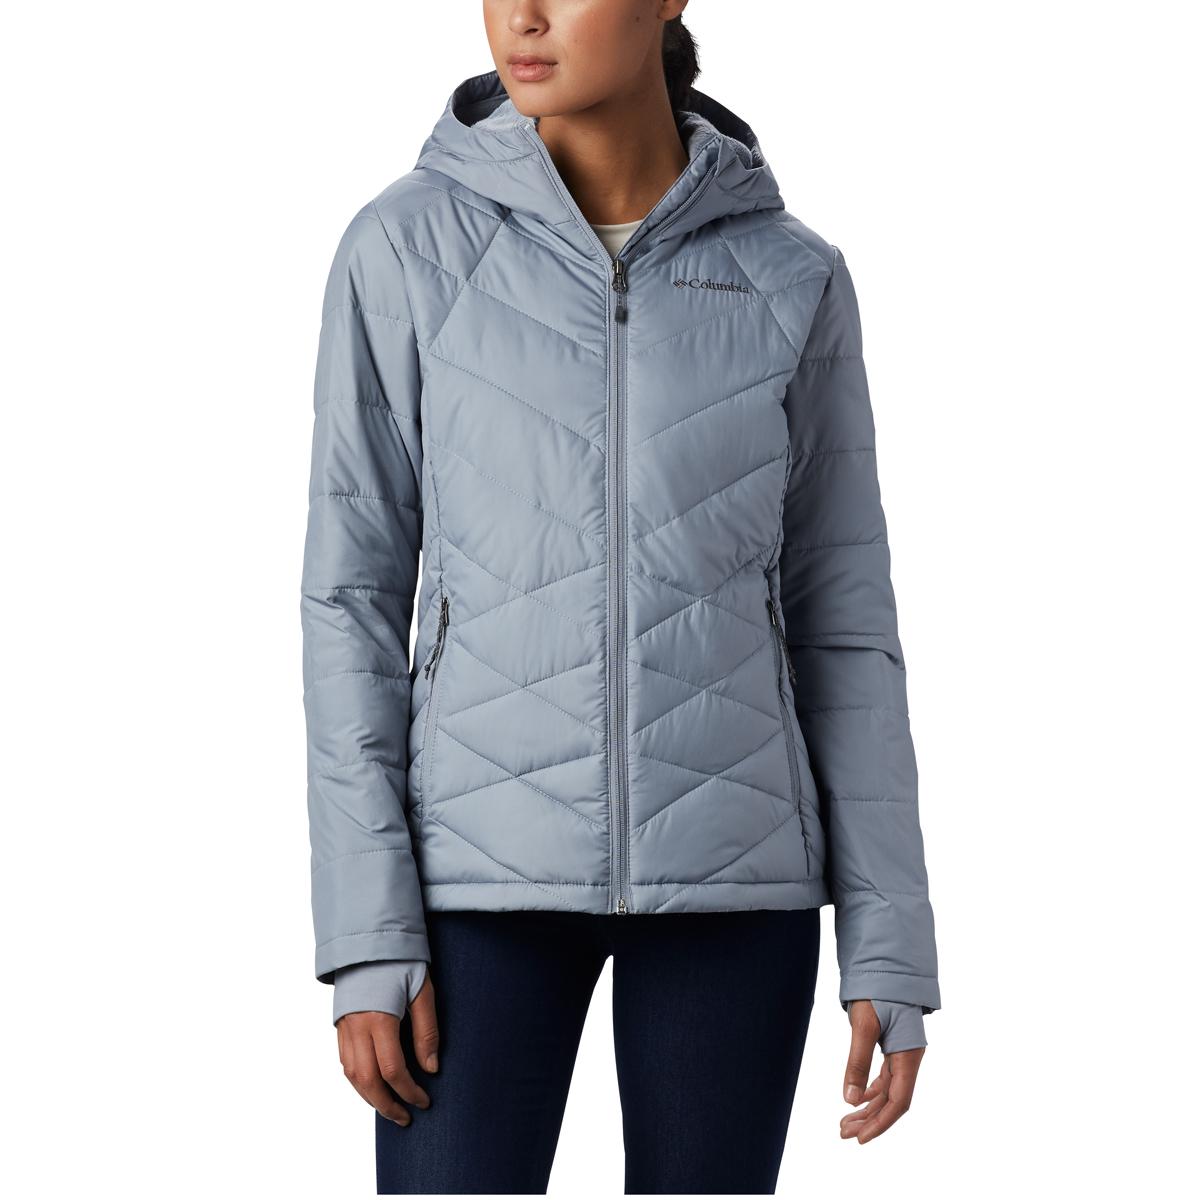 Columbia Women's Heavenly Hooded Jacket - Black, S